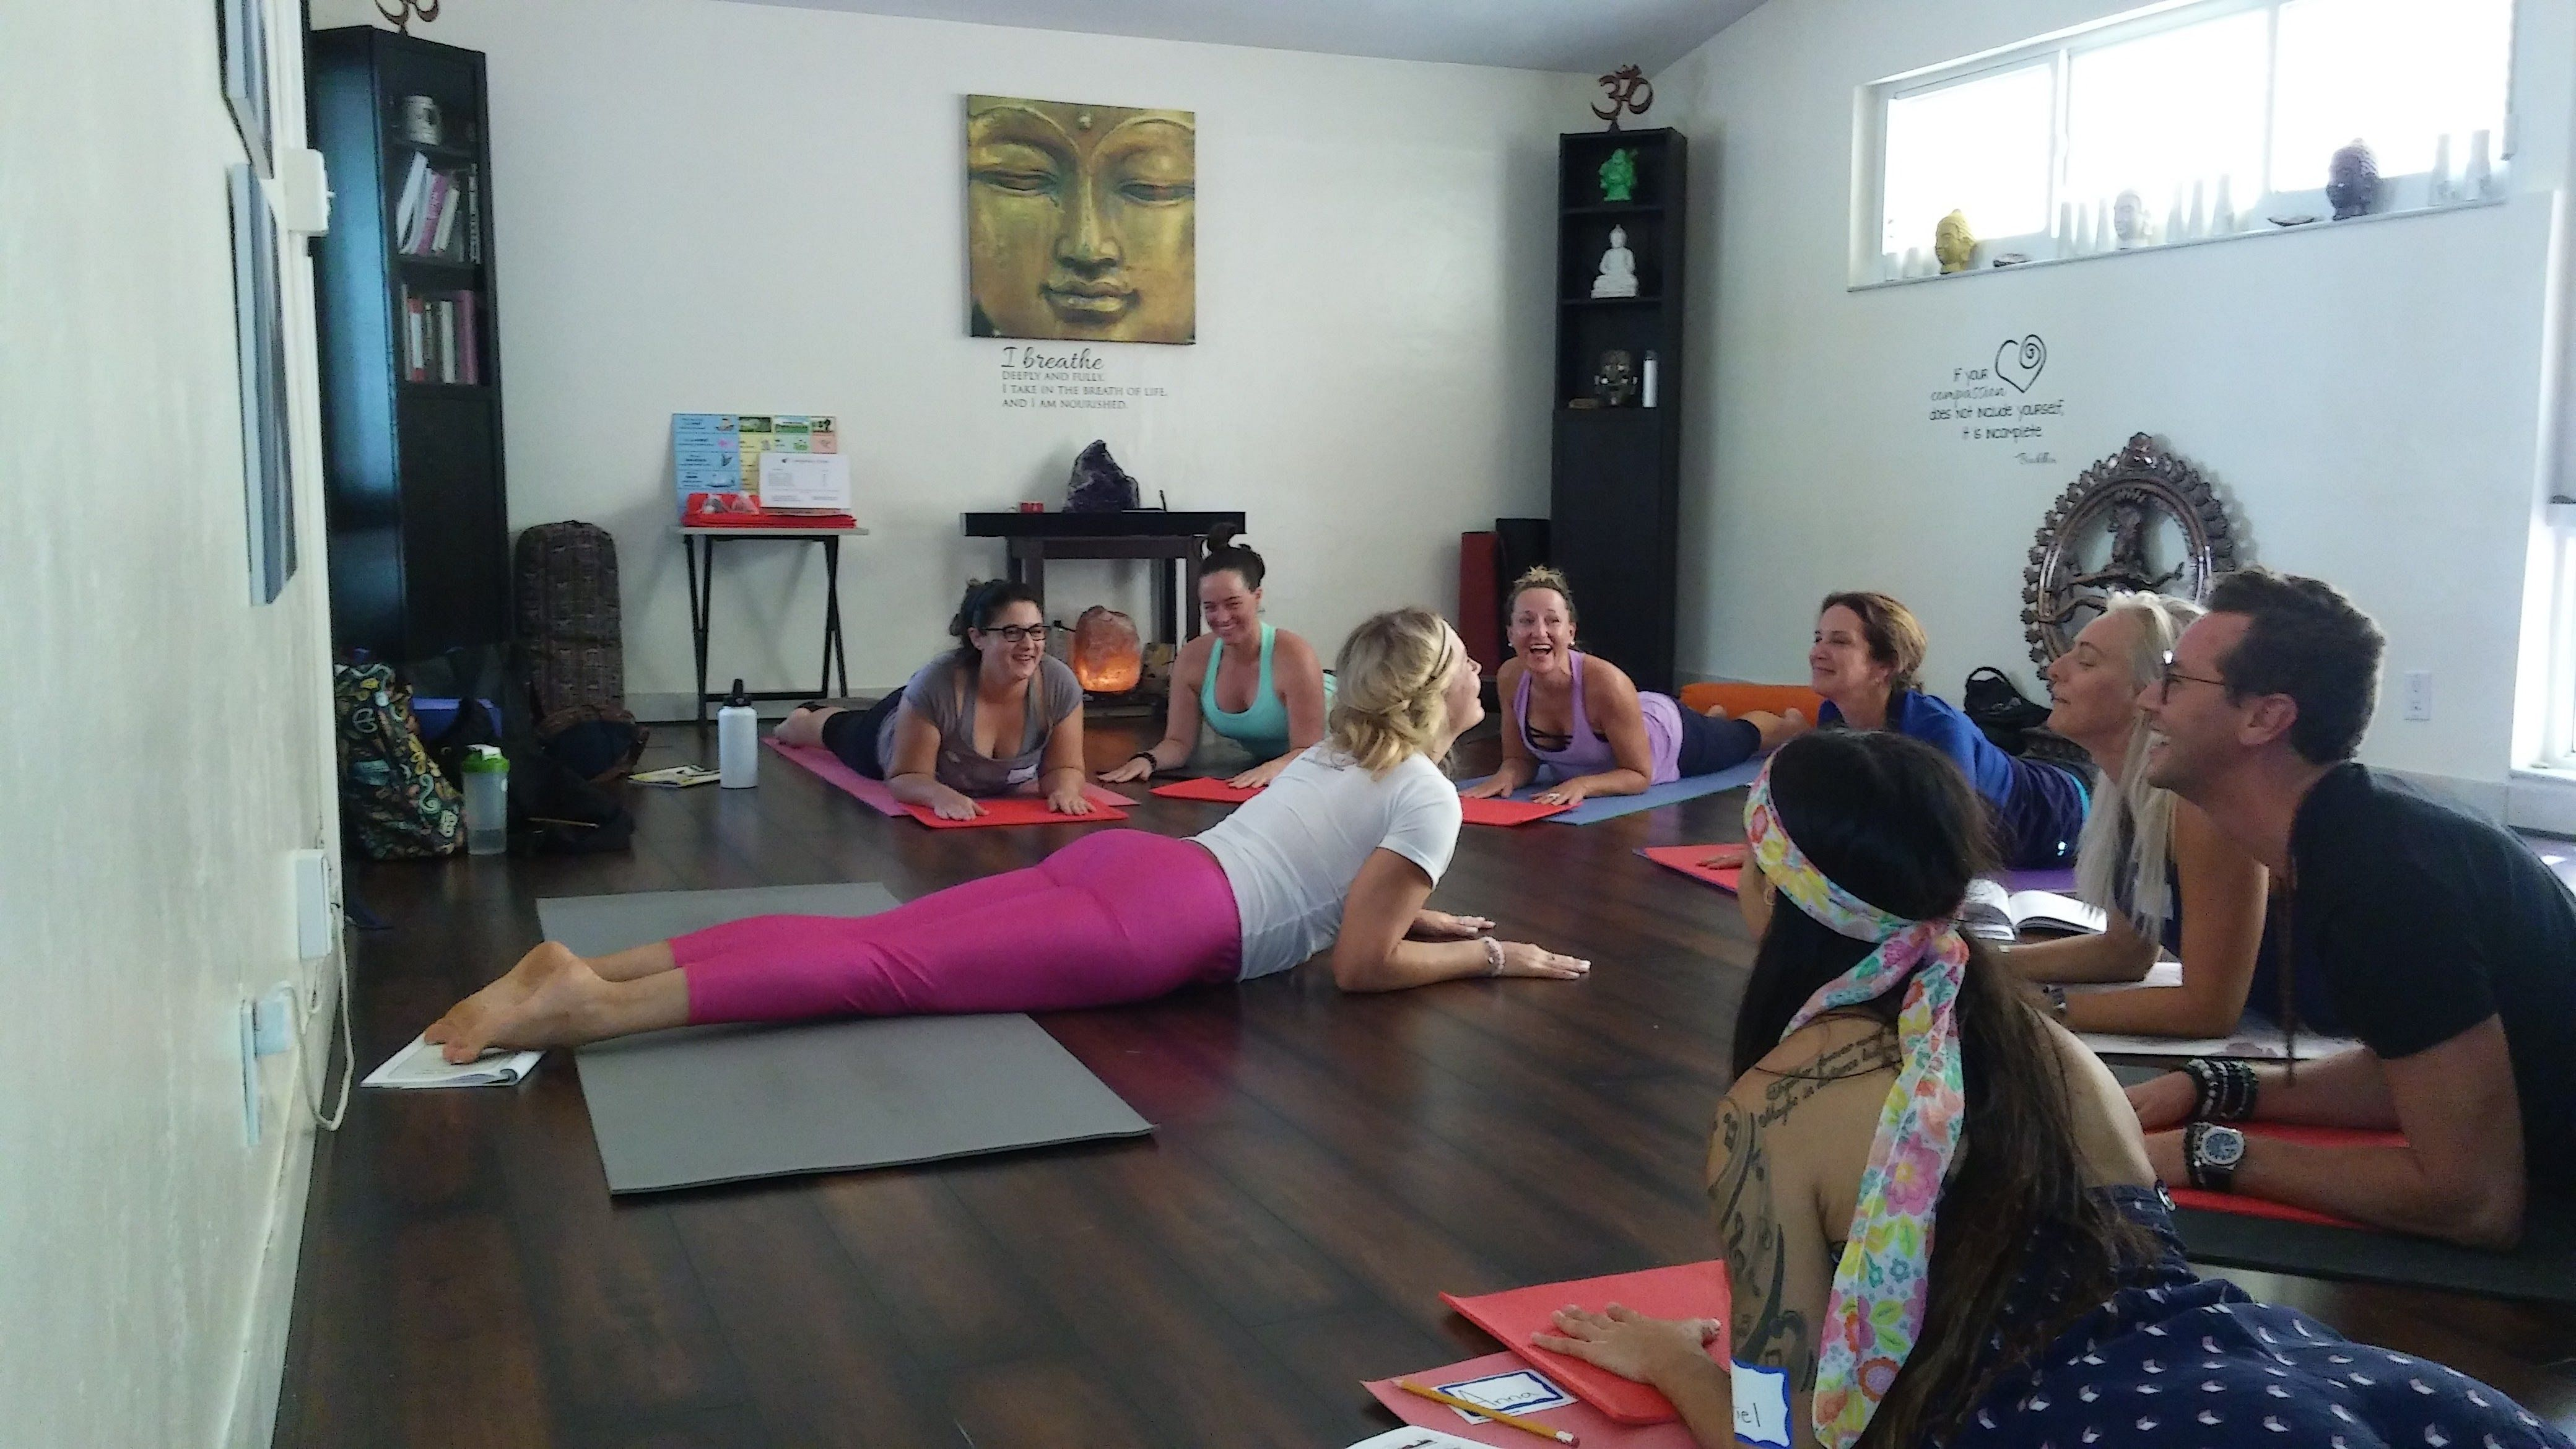 Children's Yoga Training Workshop - Zen Den Yoga School and Retreat